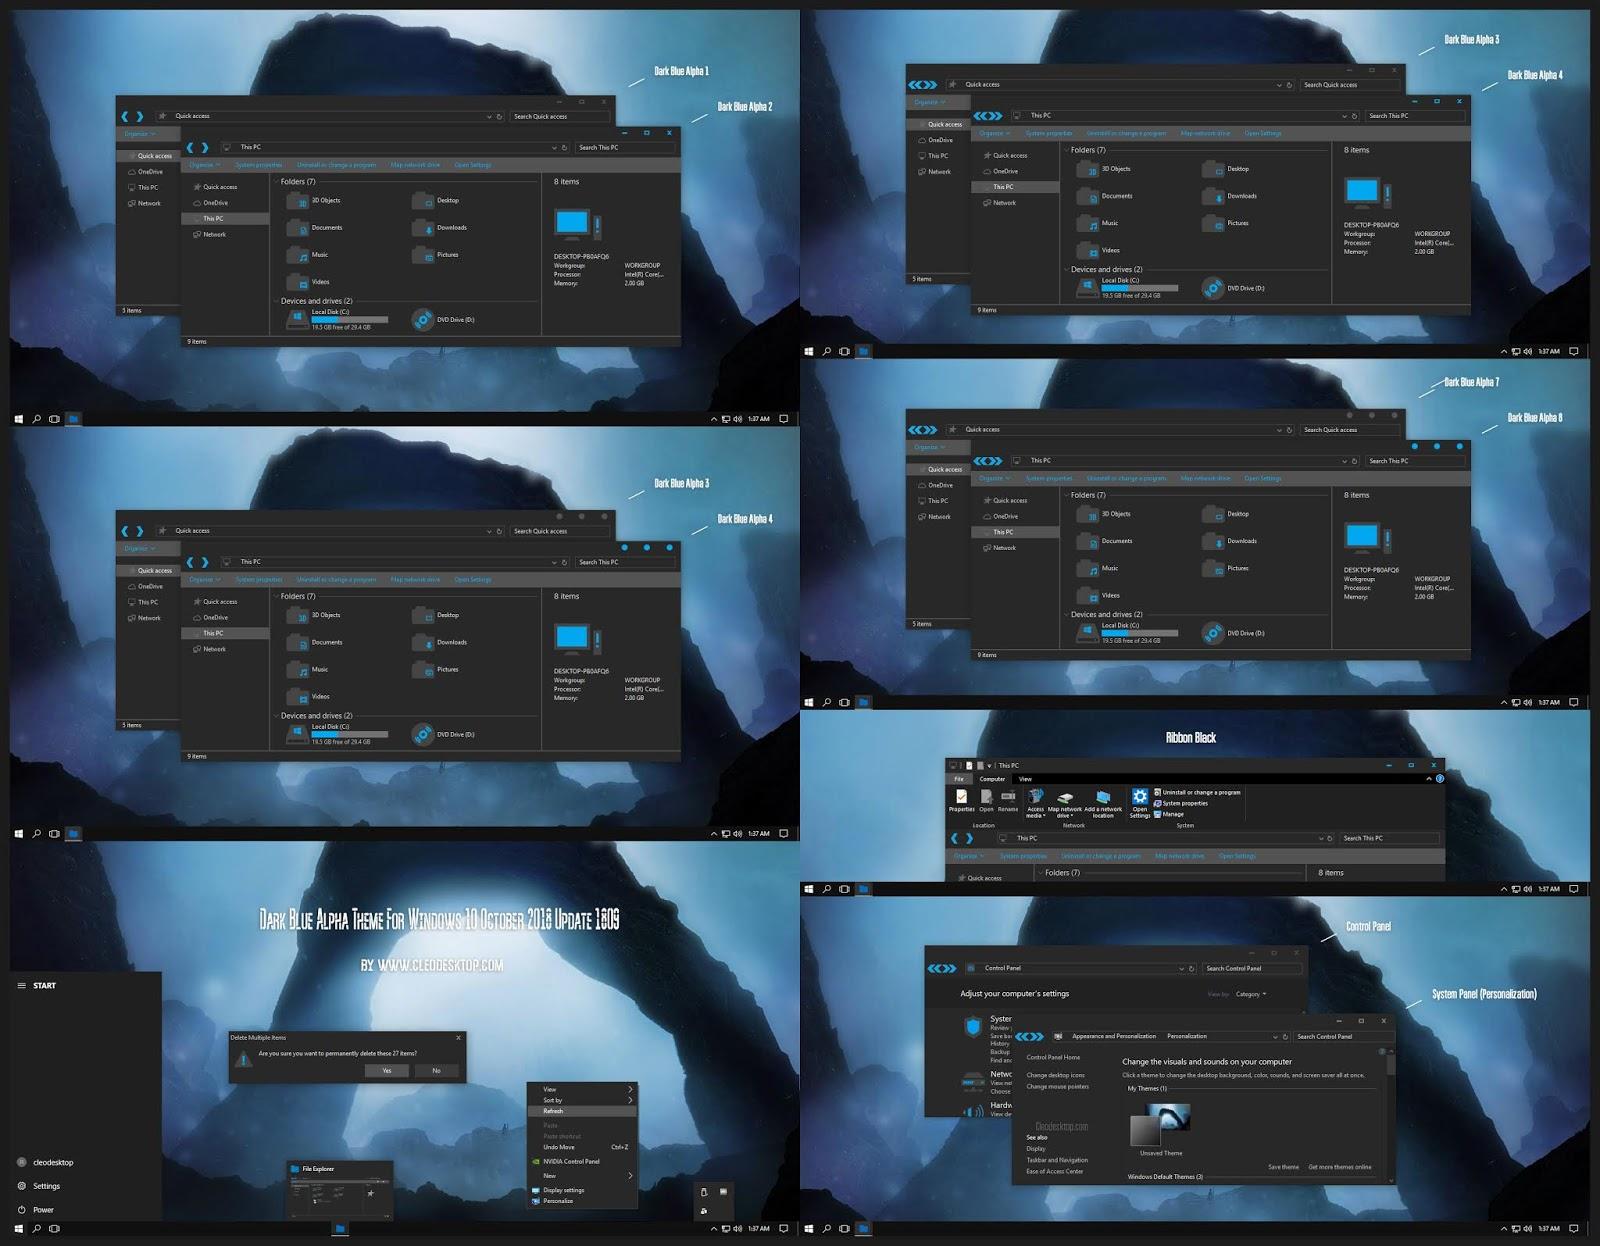 Dark Blue Alpha Theme Windows10 October 2018 Update 1809